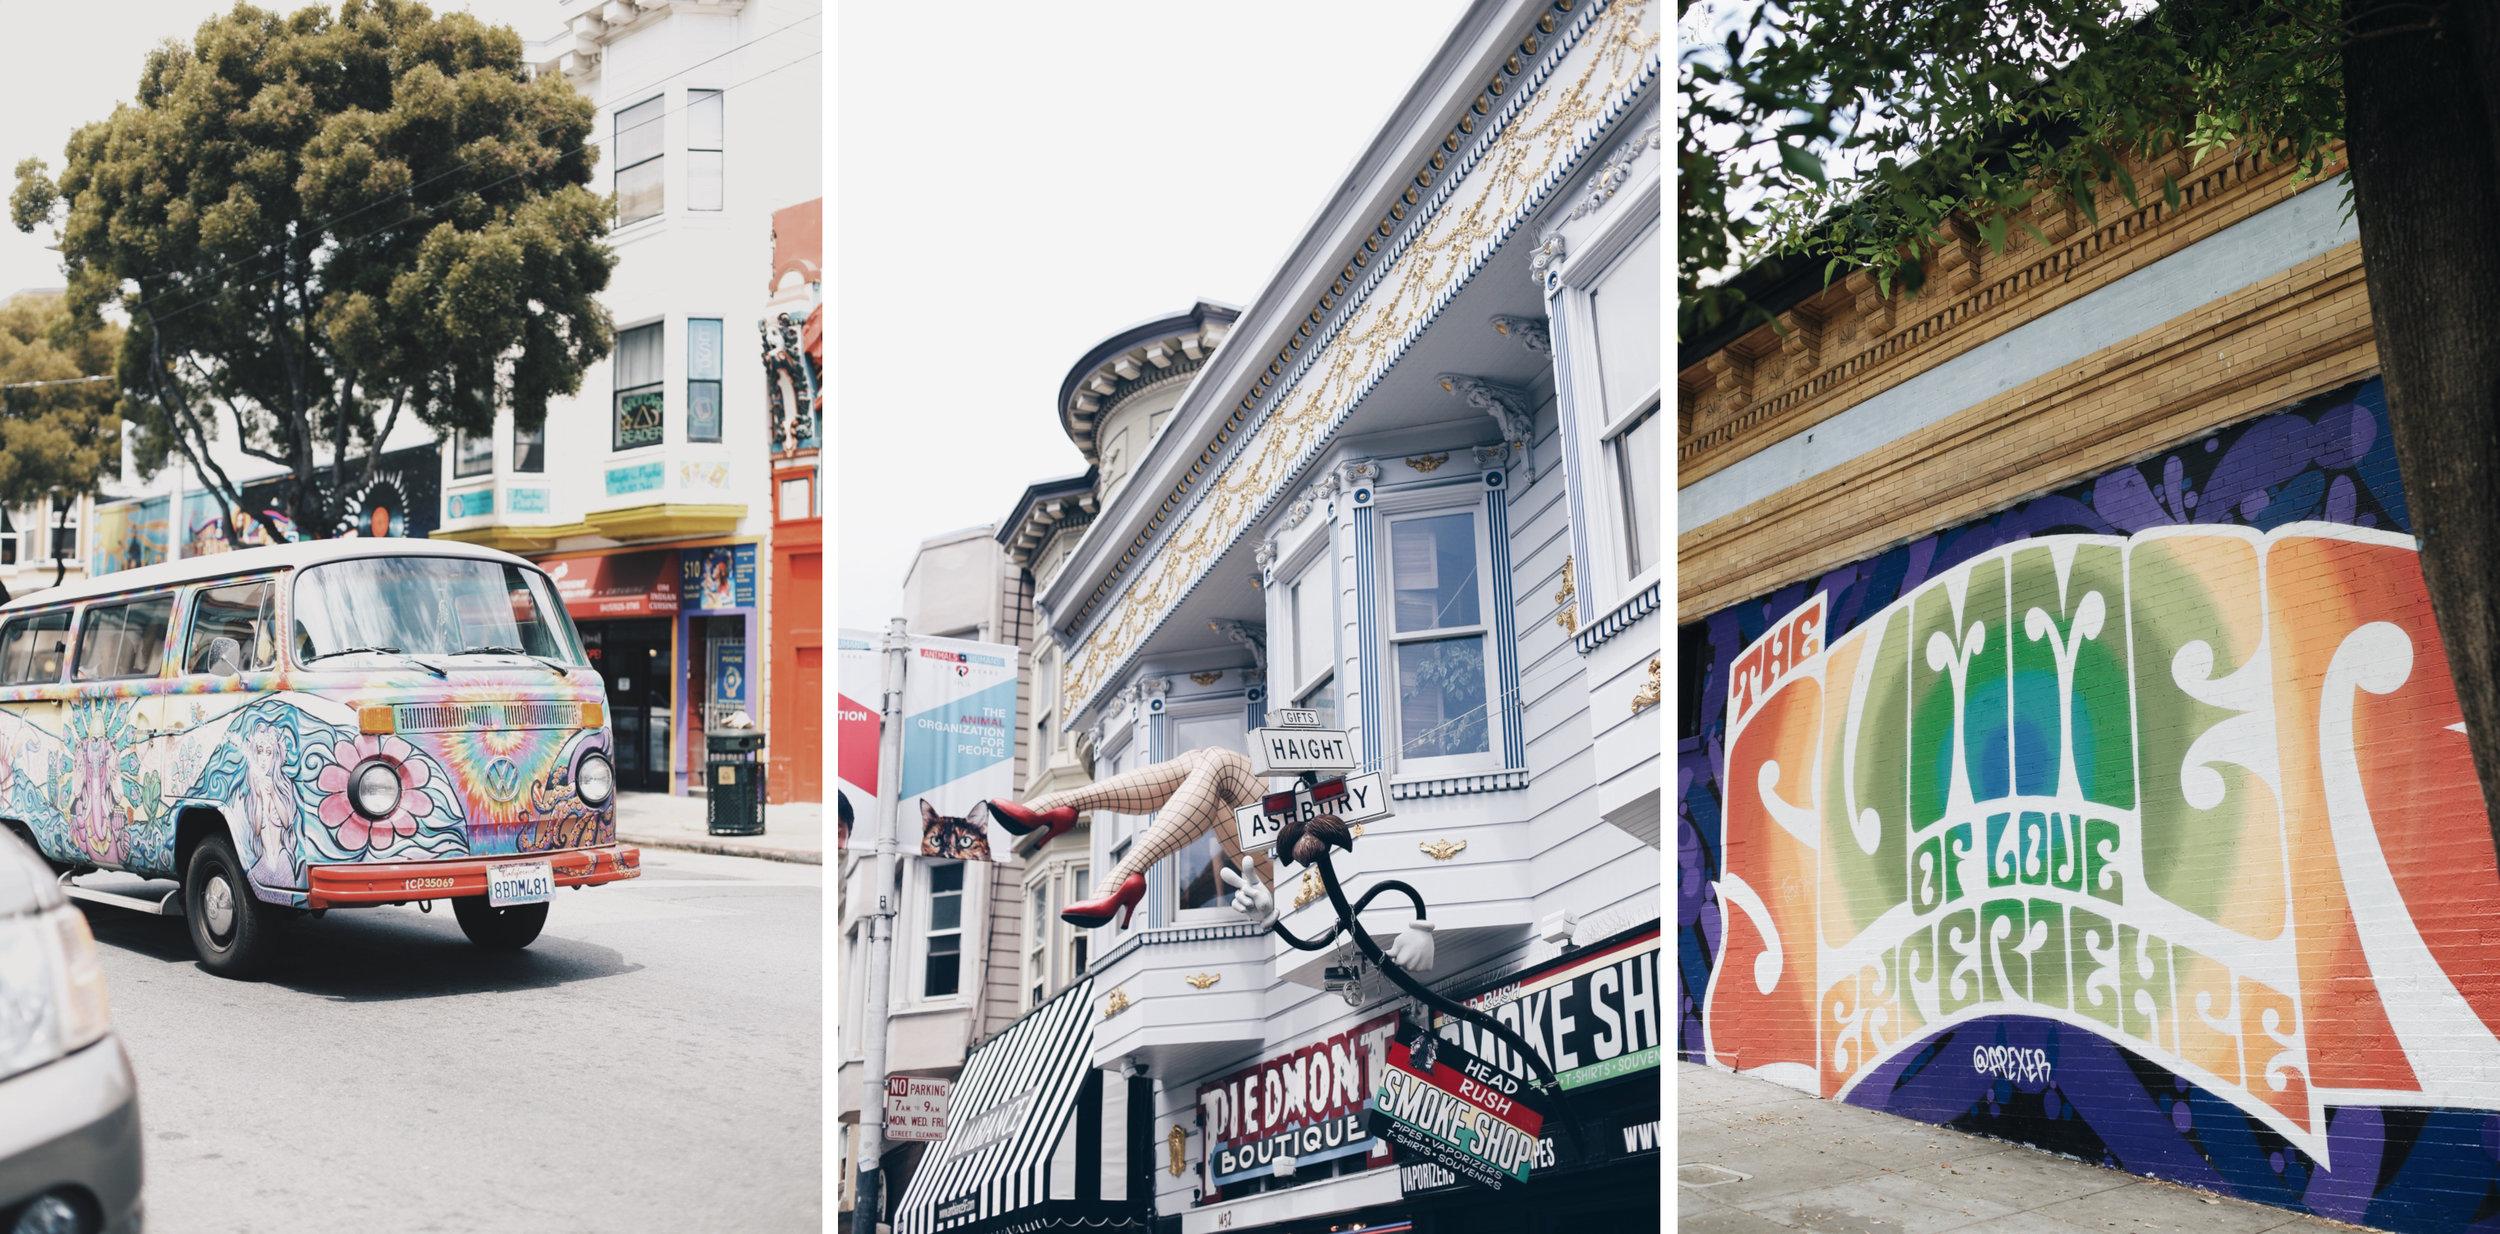 haight-ashbury-summer-of-love-san-francisco-city-guide.JPG